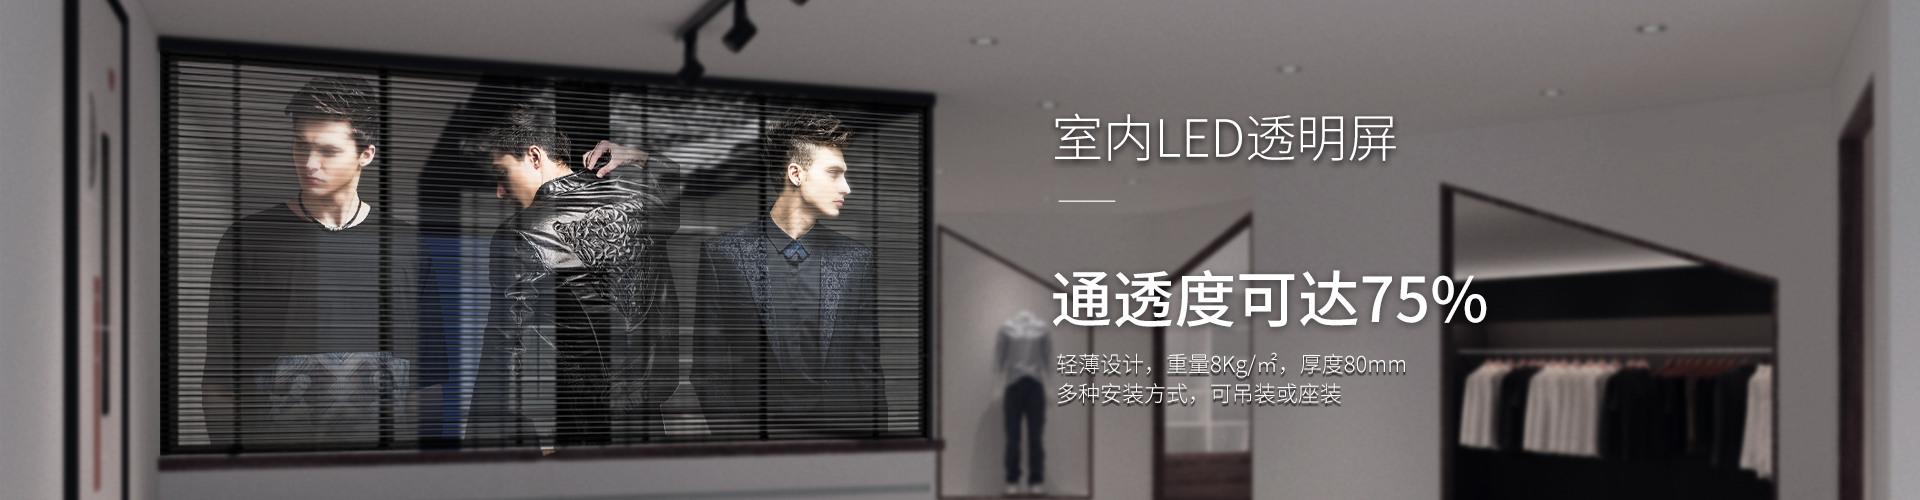 室内led透明屏